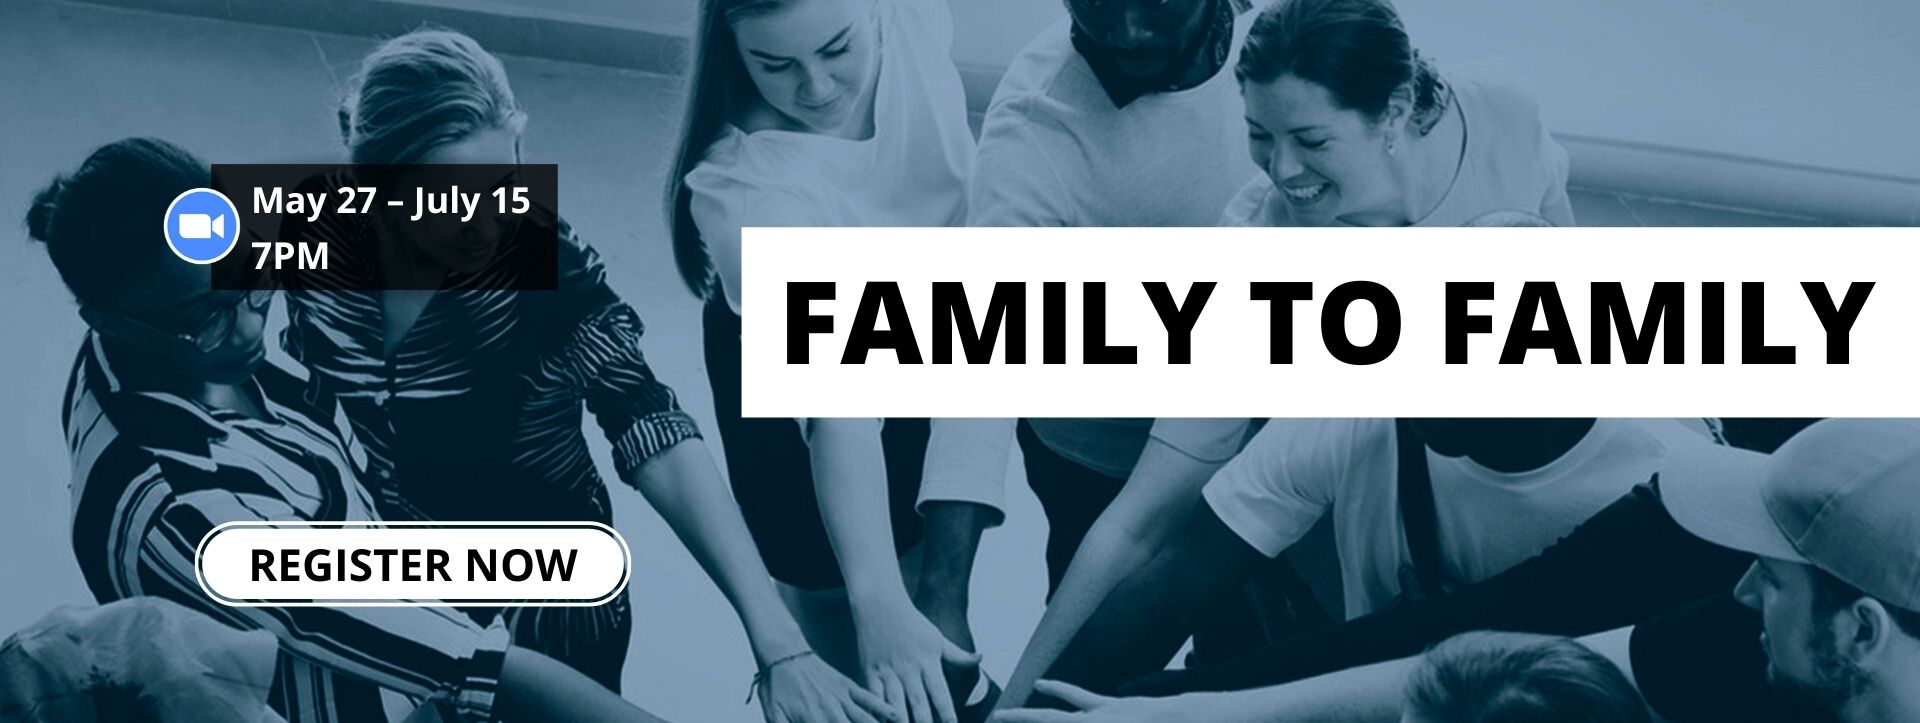 FAMILY TO FAMILY NAMI 3 Home - NAMI CCNS